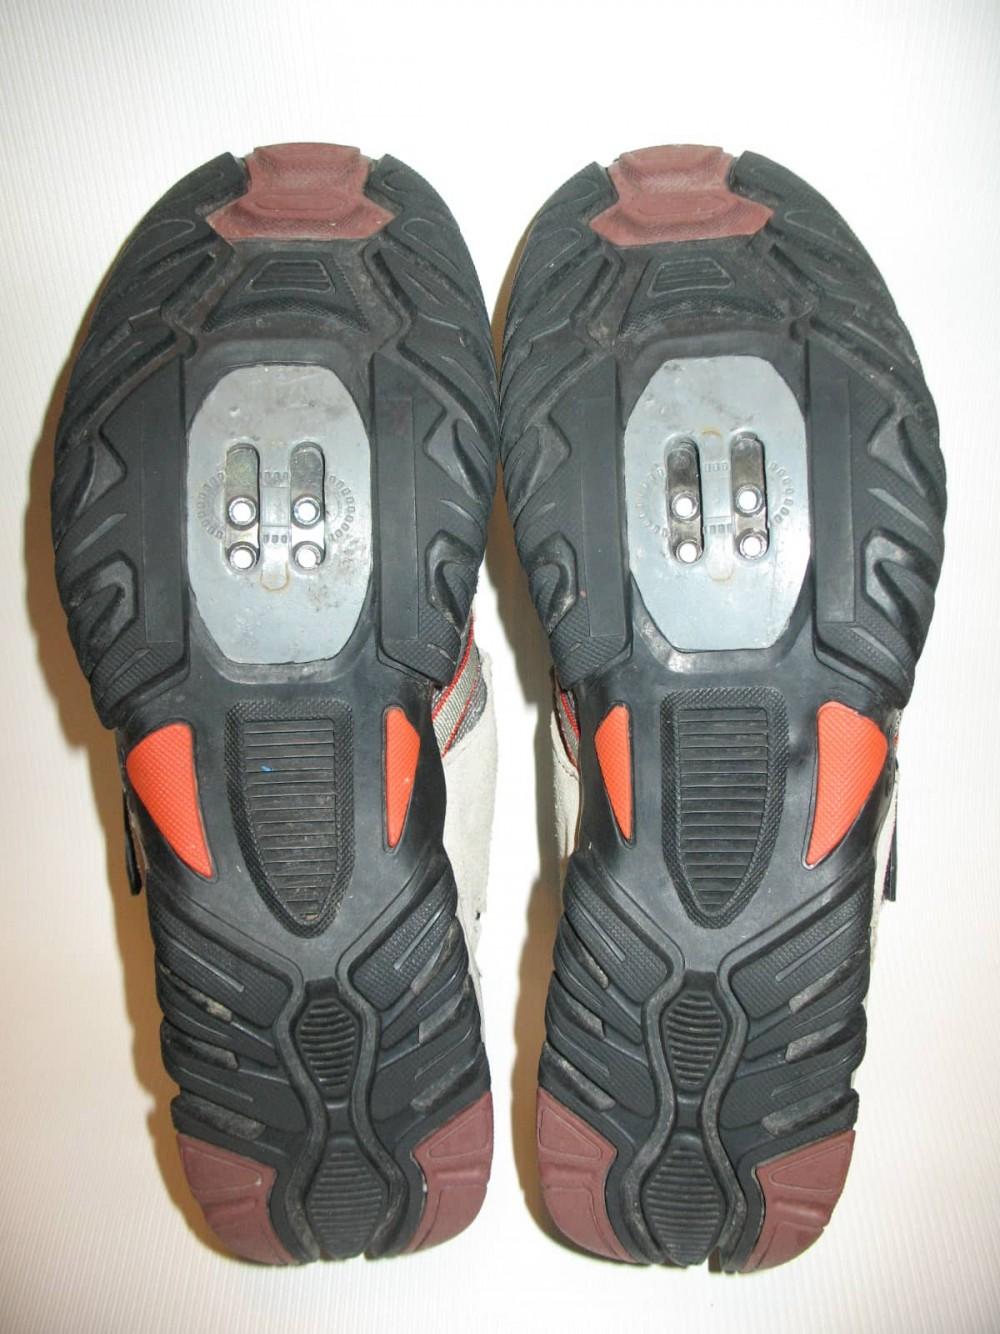 Велотуфли SHIMANO sh-wm 40 mtb shoes lady (размер US6.5/EU38(на стопу 238 mm)) - 7